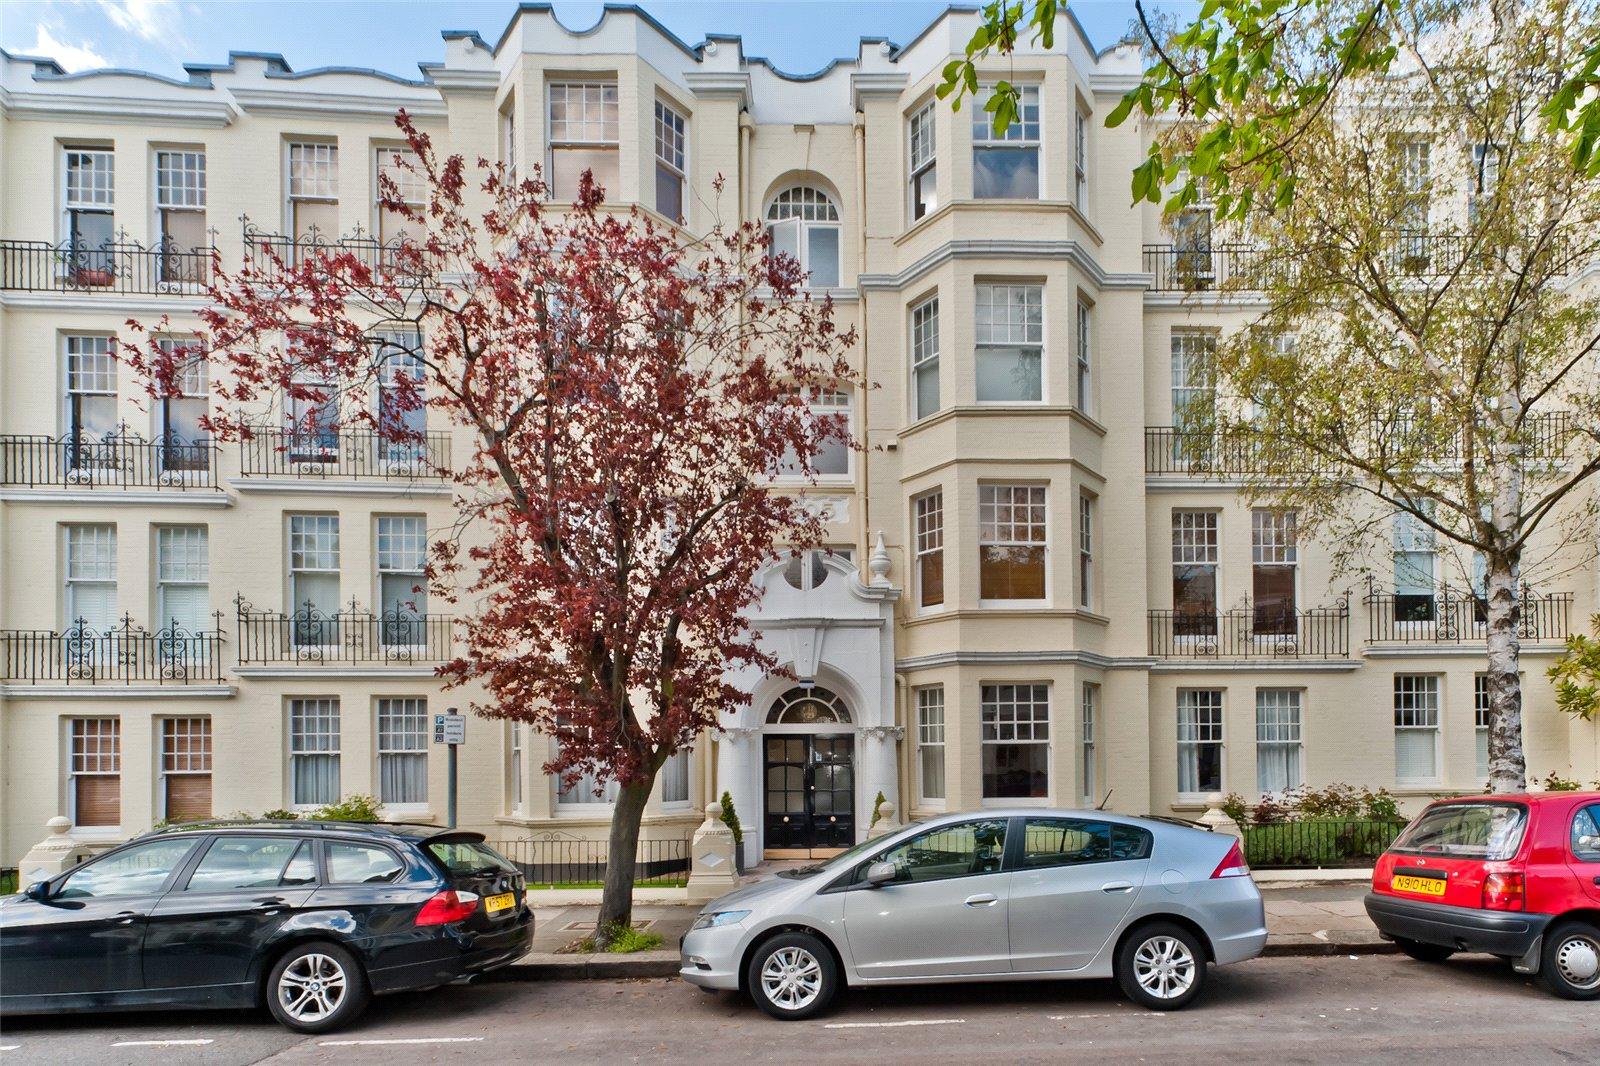 Onslow Avenue Mansions, Onslow Avenue, TW10 6QD - Antony Roberts